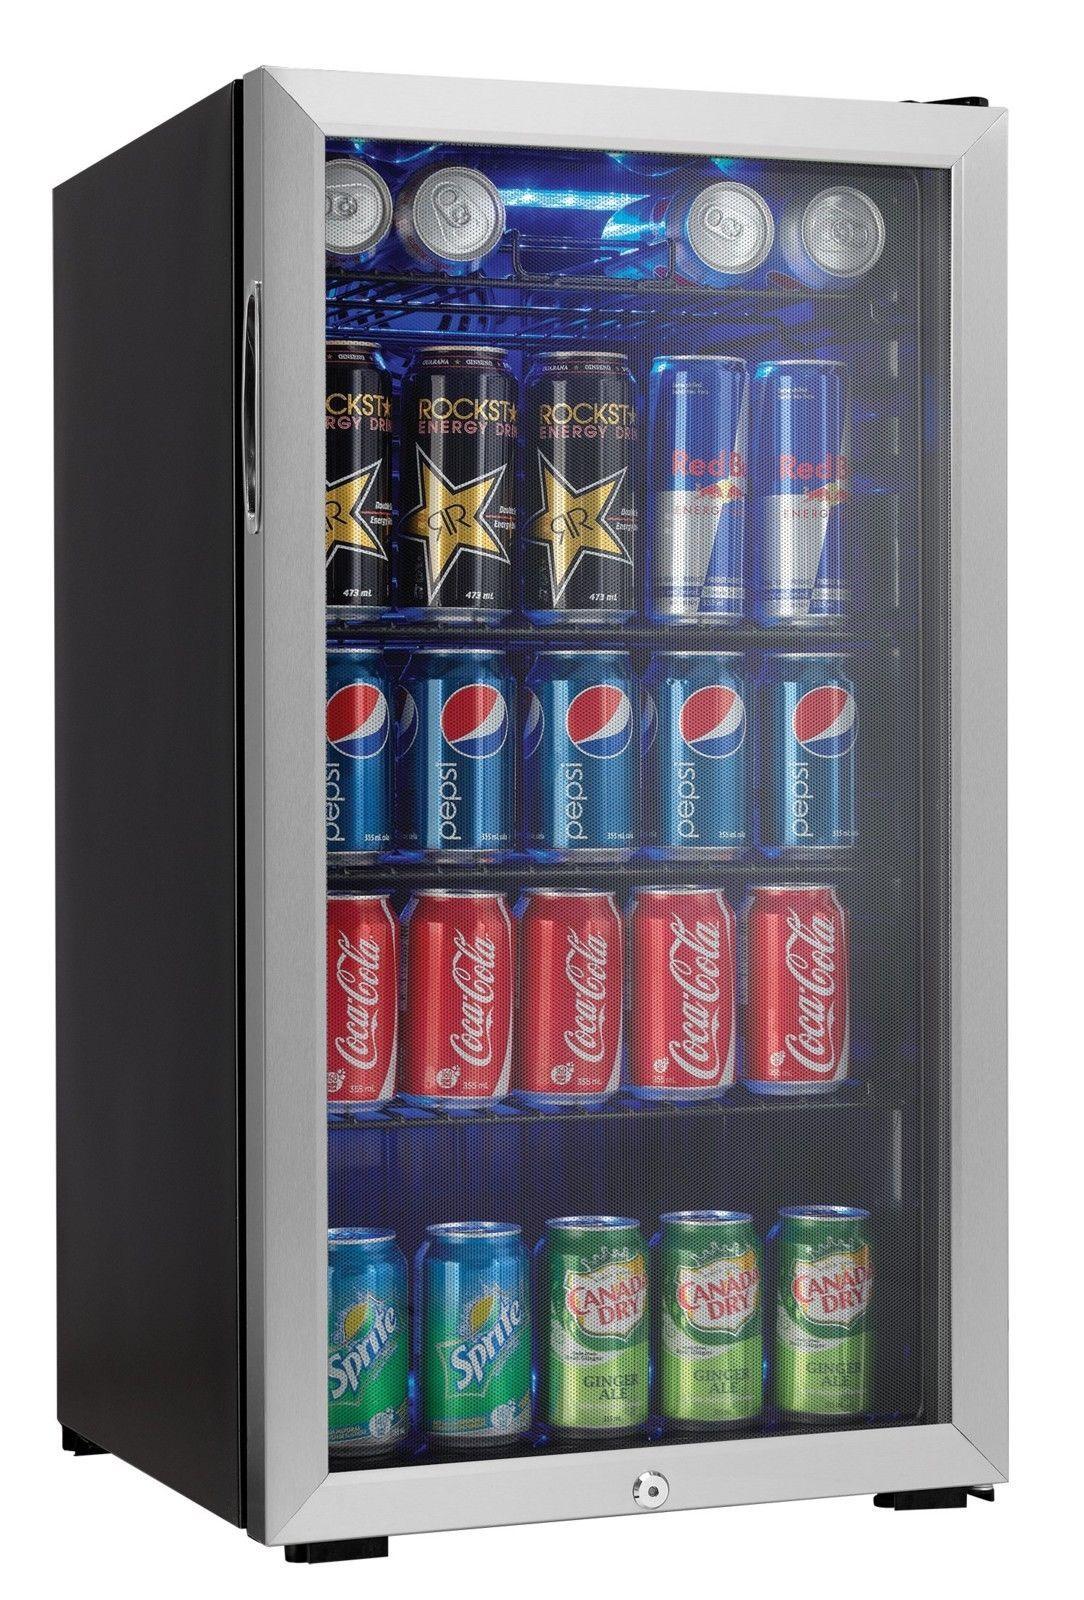 Beverage Refrigerator Center Can Mini Fridge Stainless Steel Glass Door Freezer